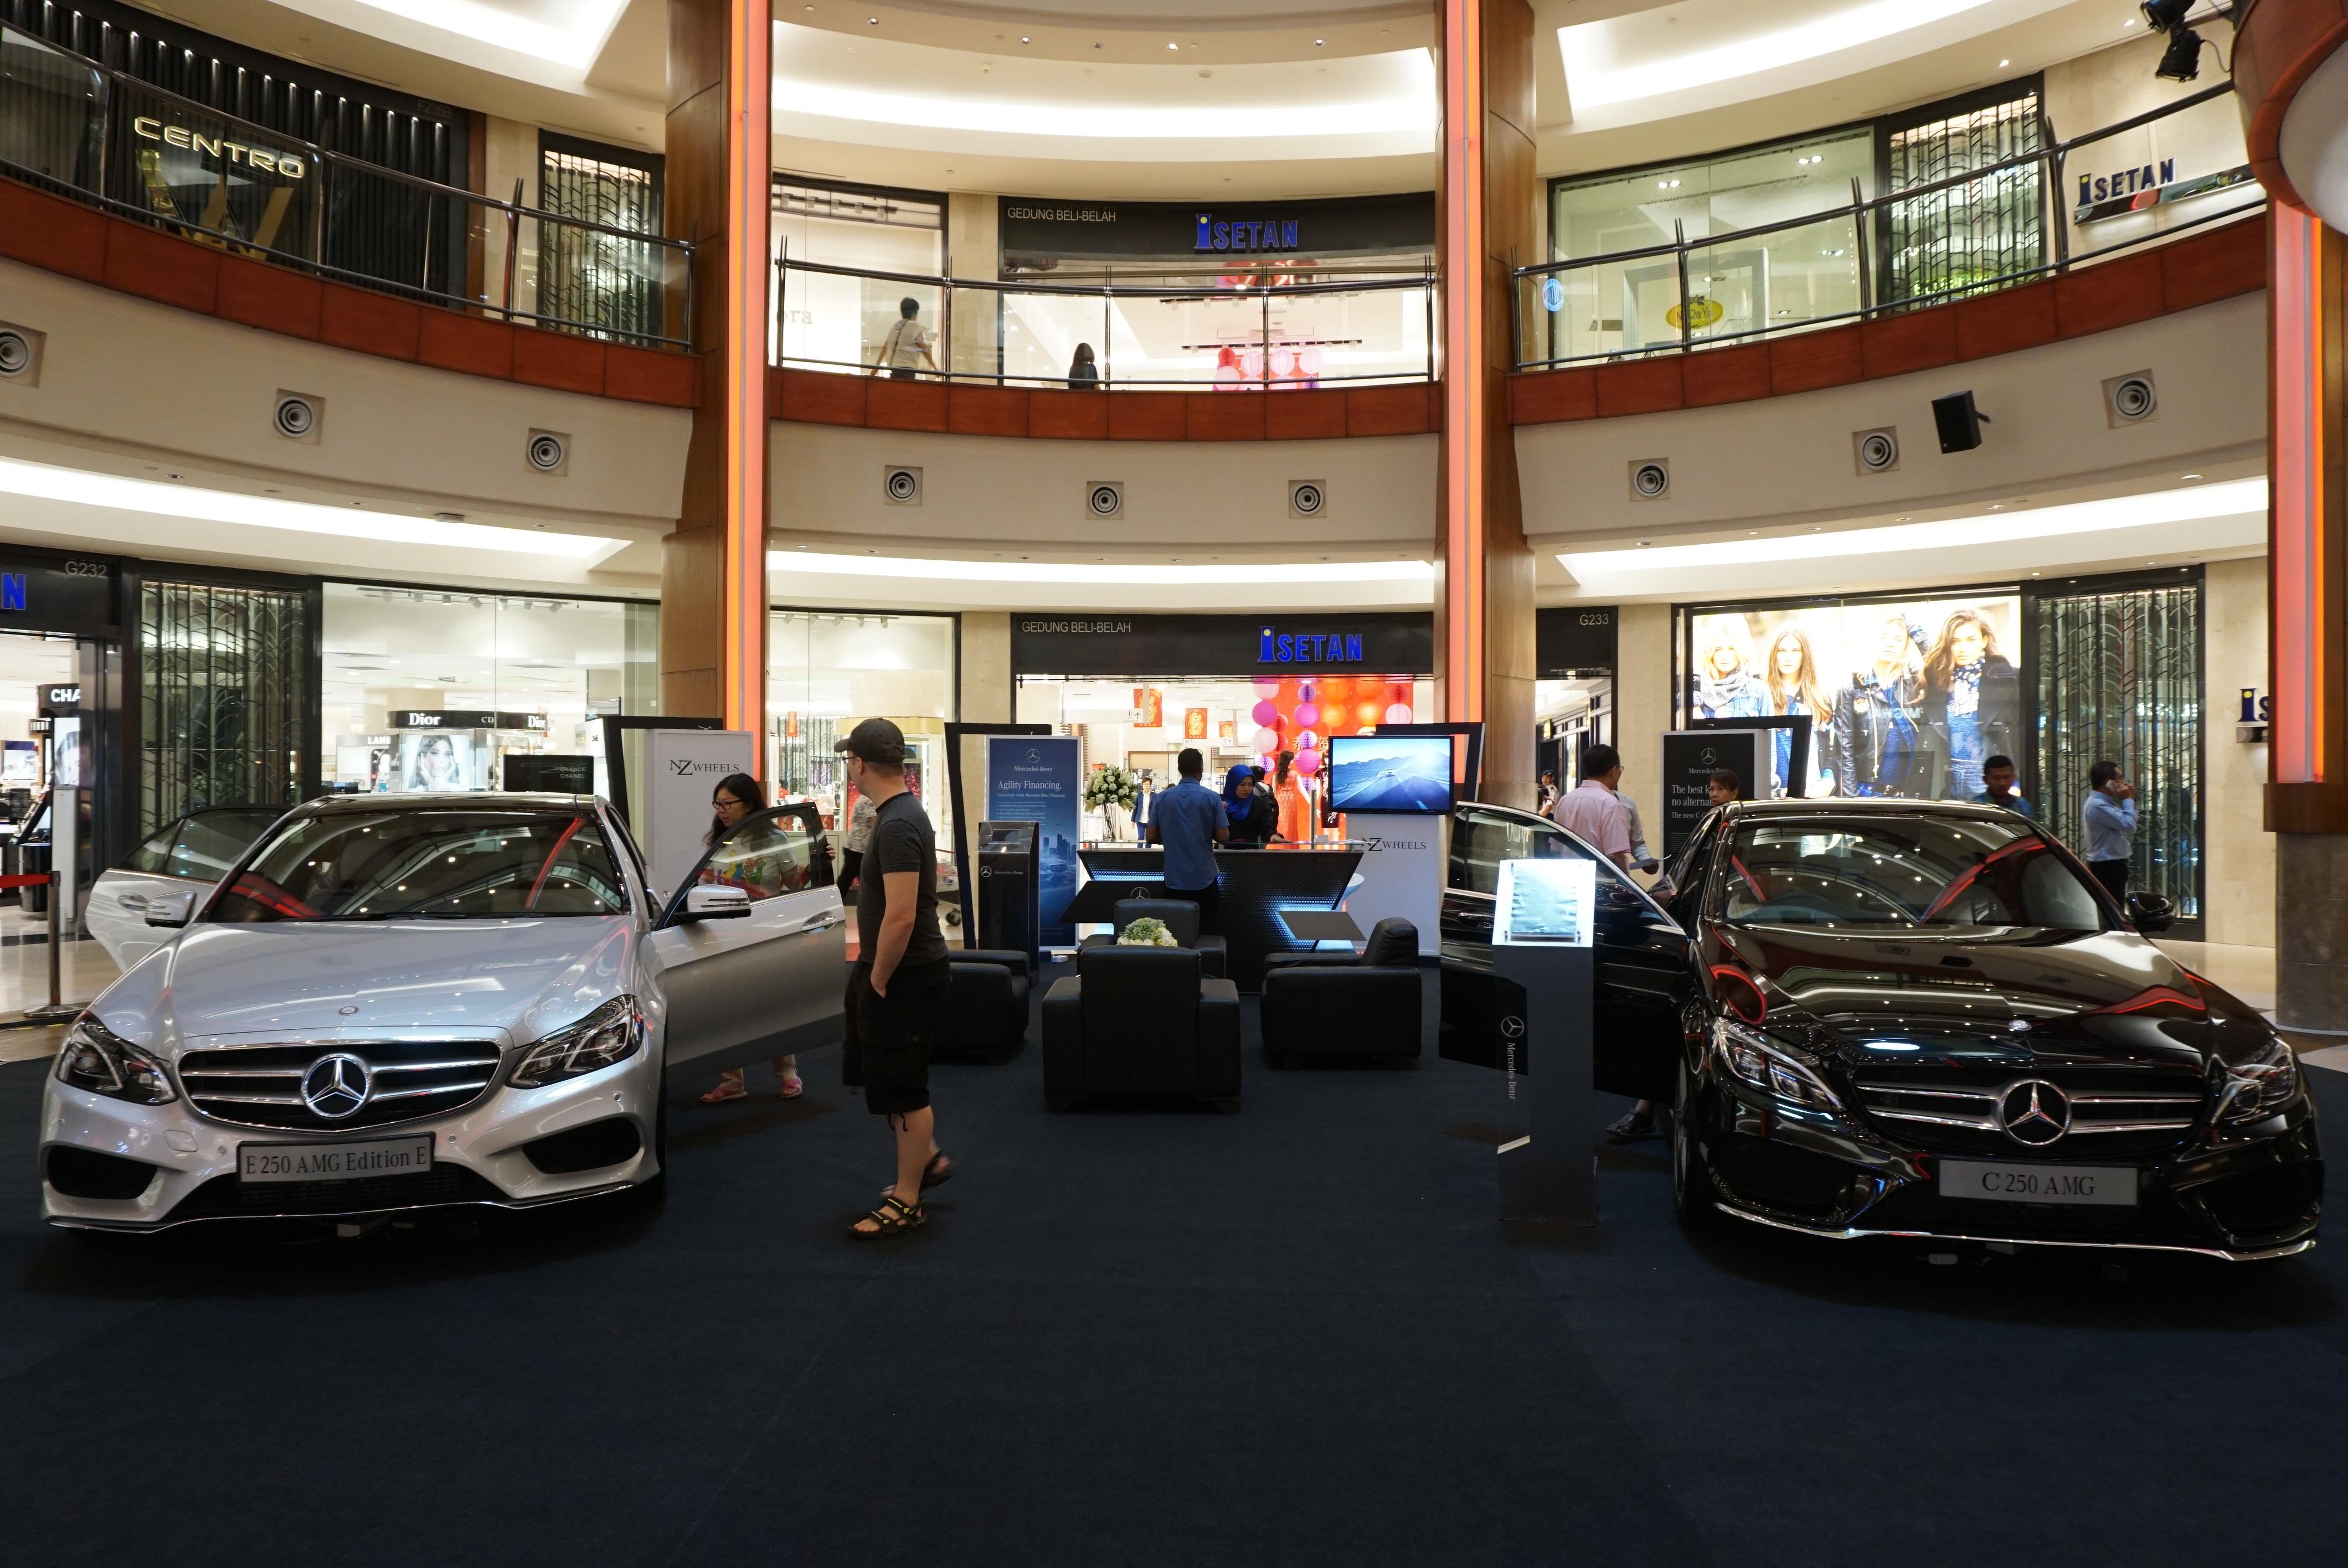 The gardens mall nz wheels mercedes benz for Mercedes benz miami gardens